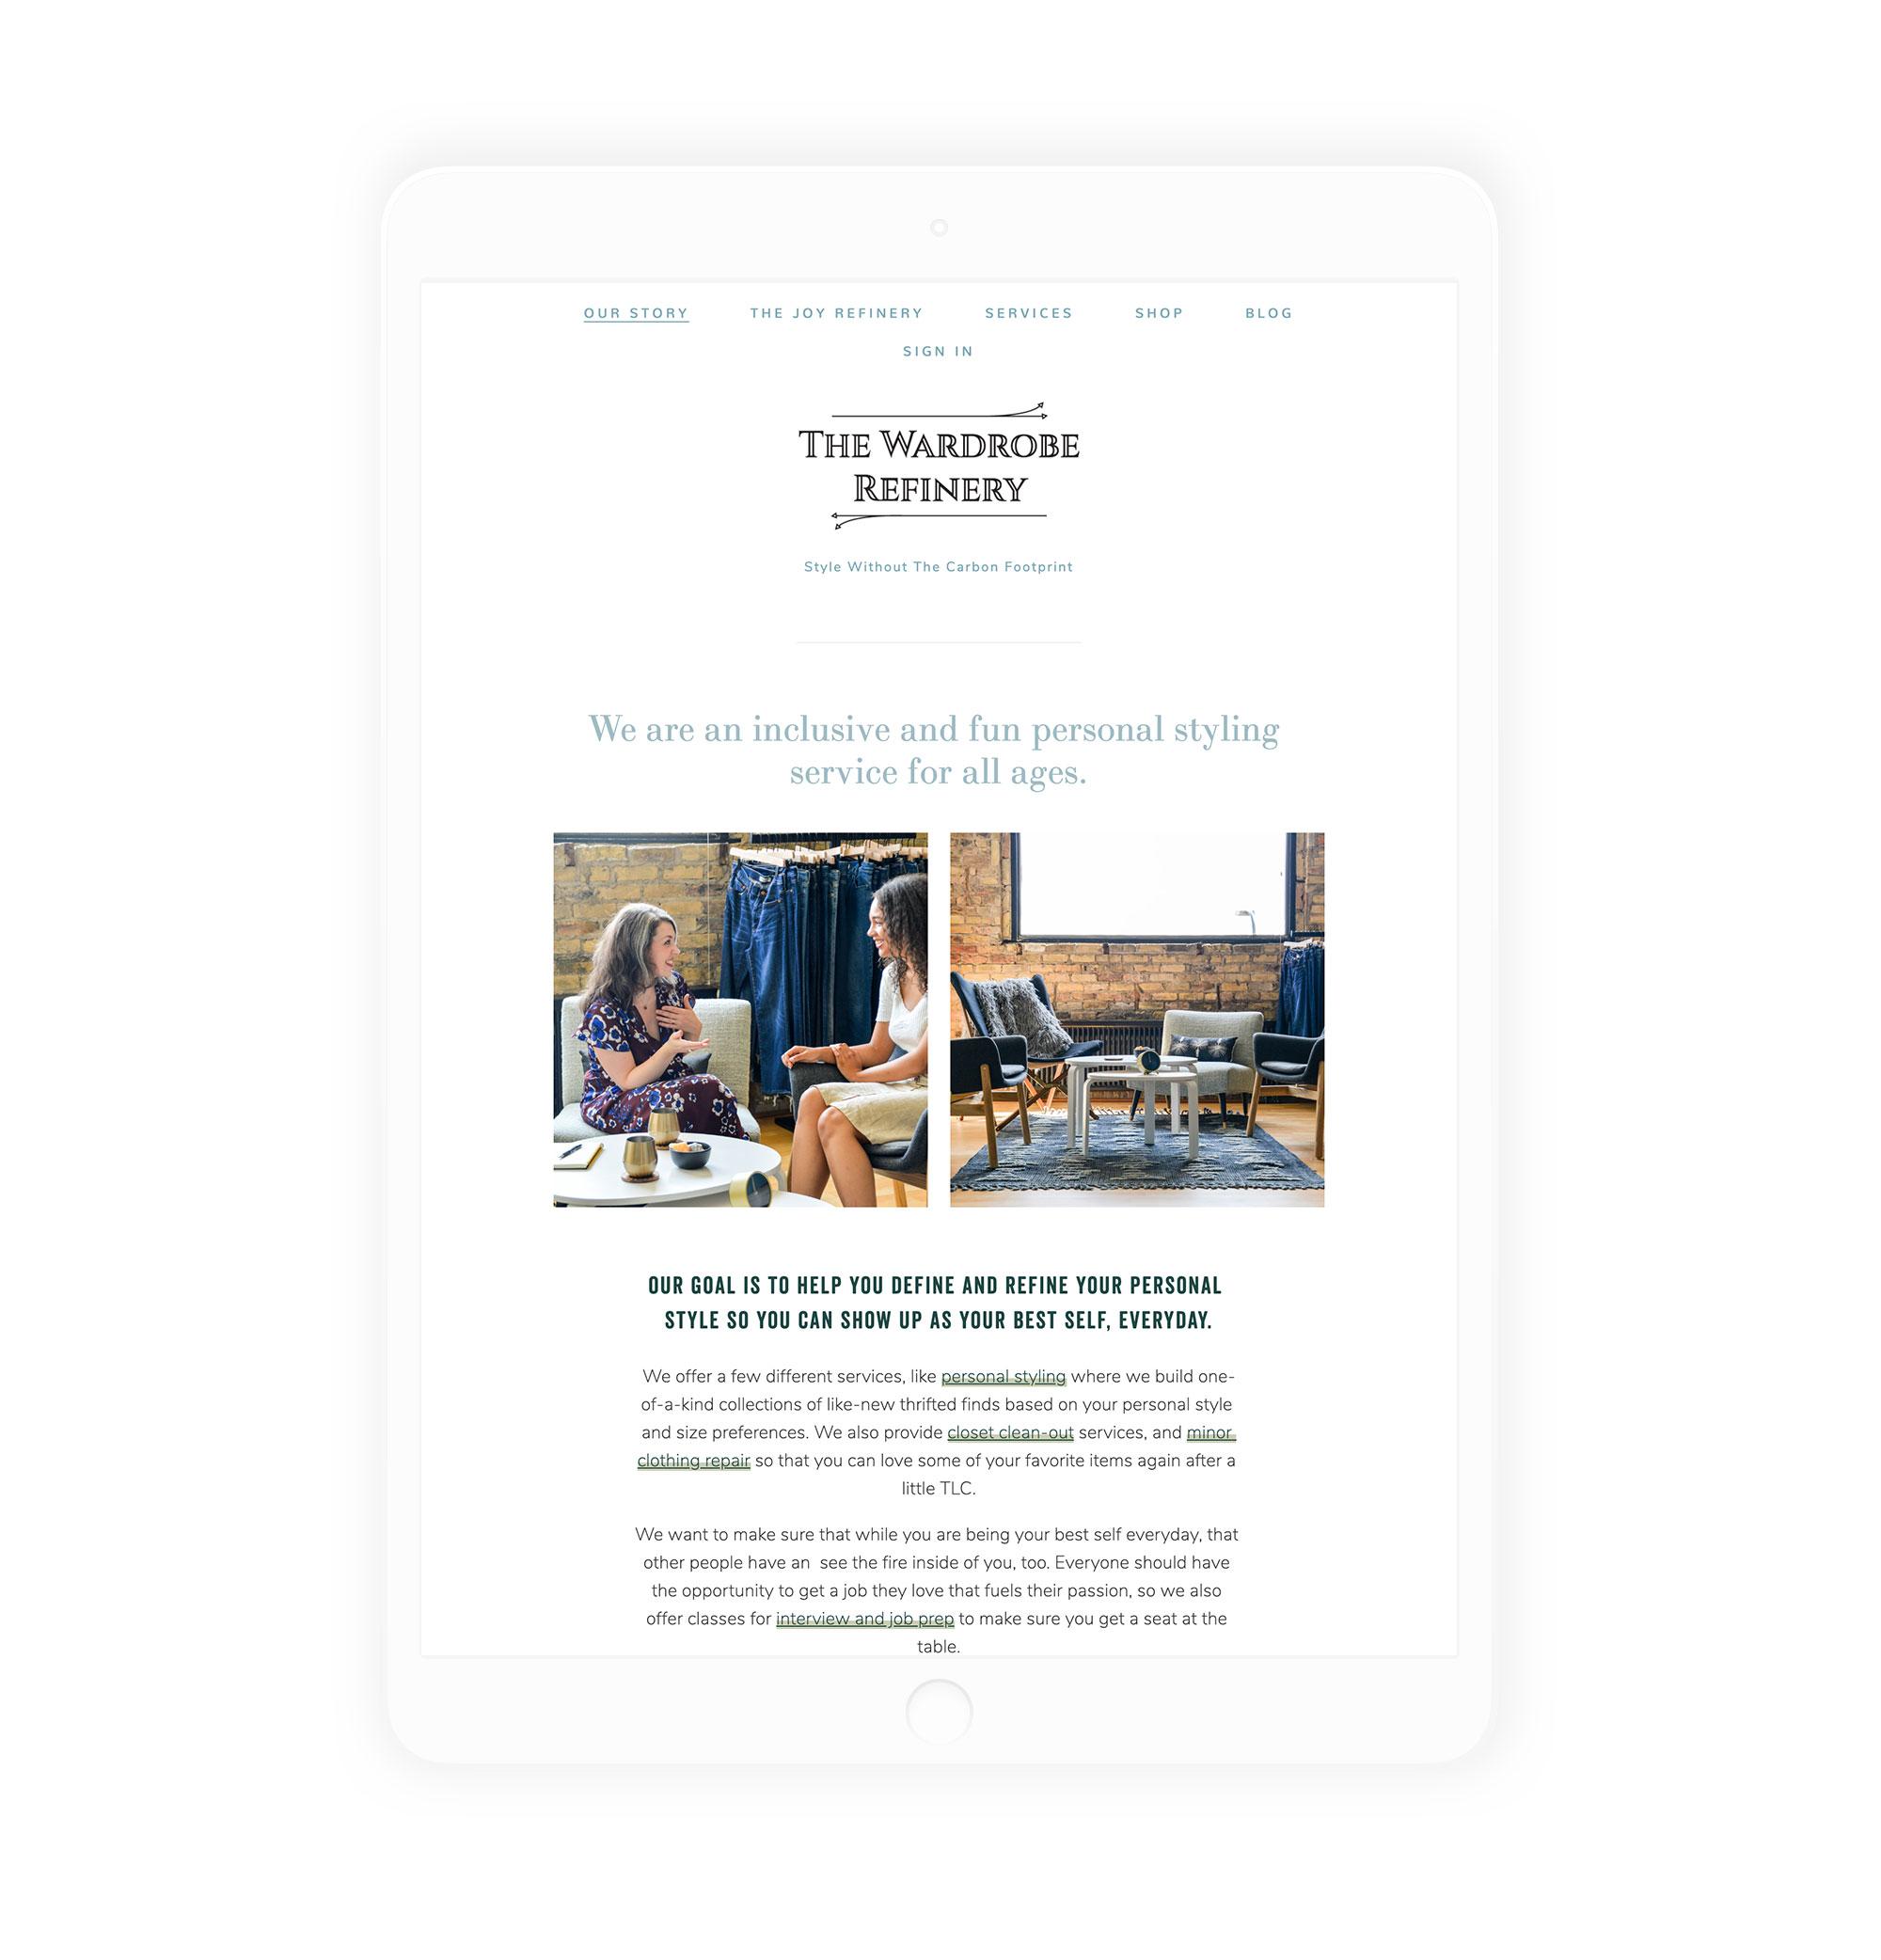 wardrobe-refinery-web-iPad-1.jpg